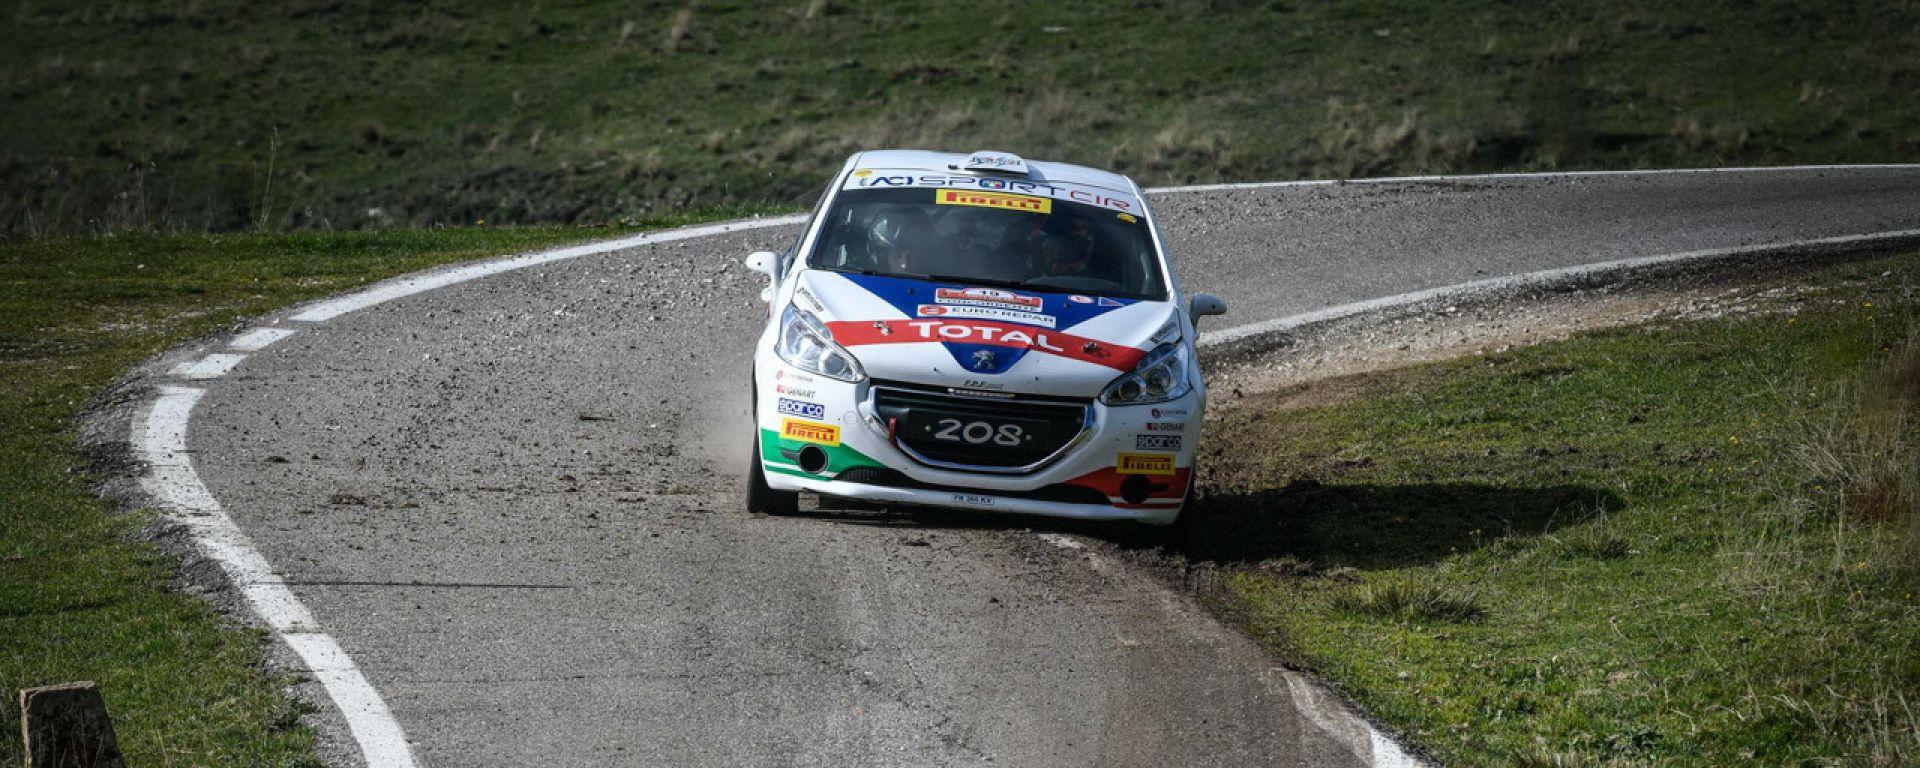 Tommaso Ciuffi - Peugeot 208 R2B